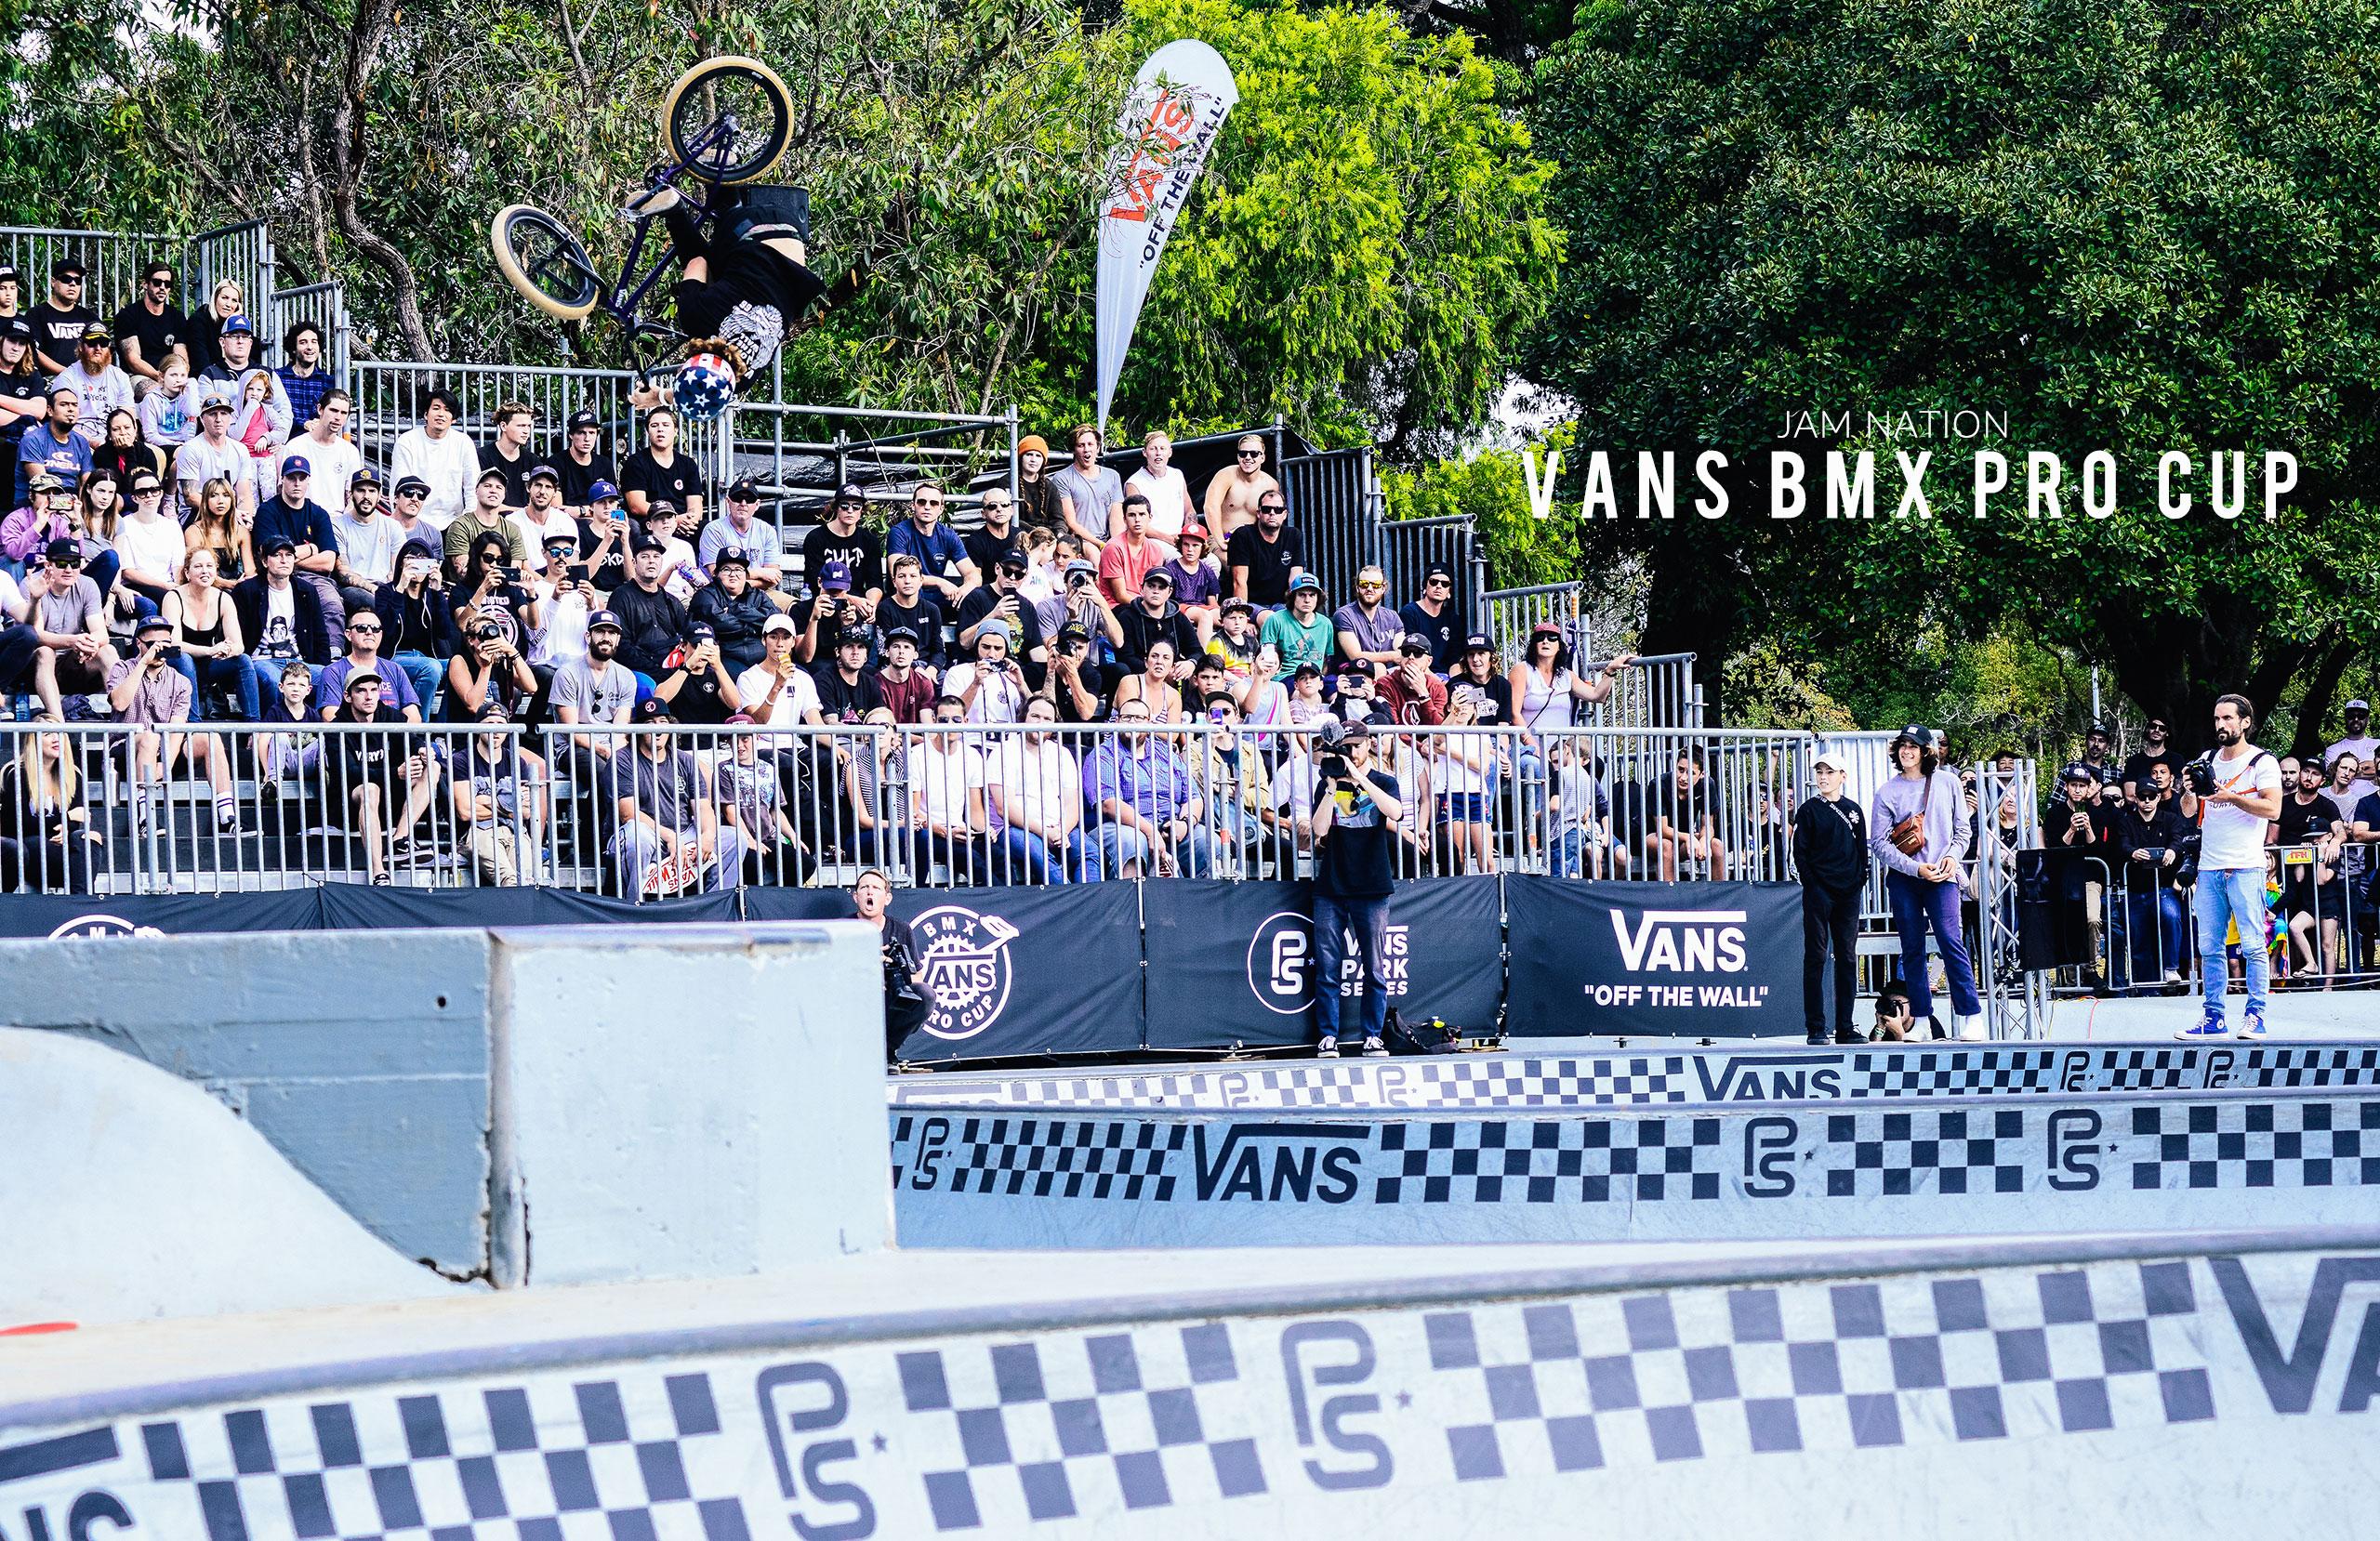 Vans BMX Pro Cup – Gallery #1